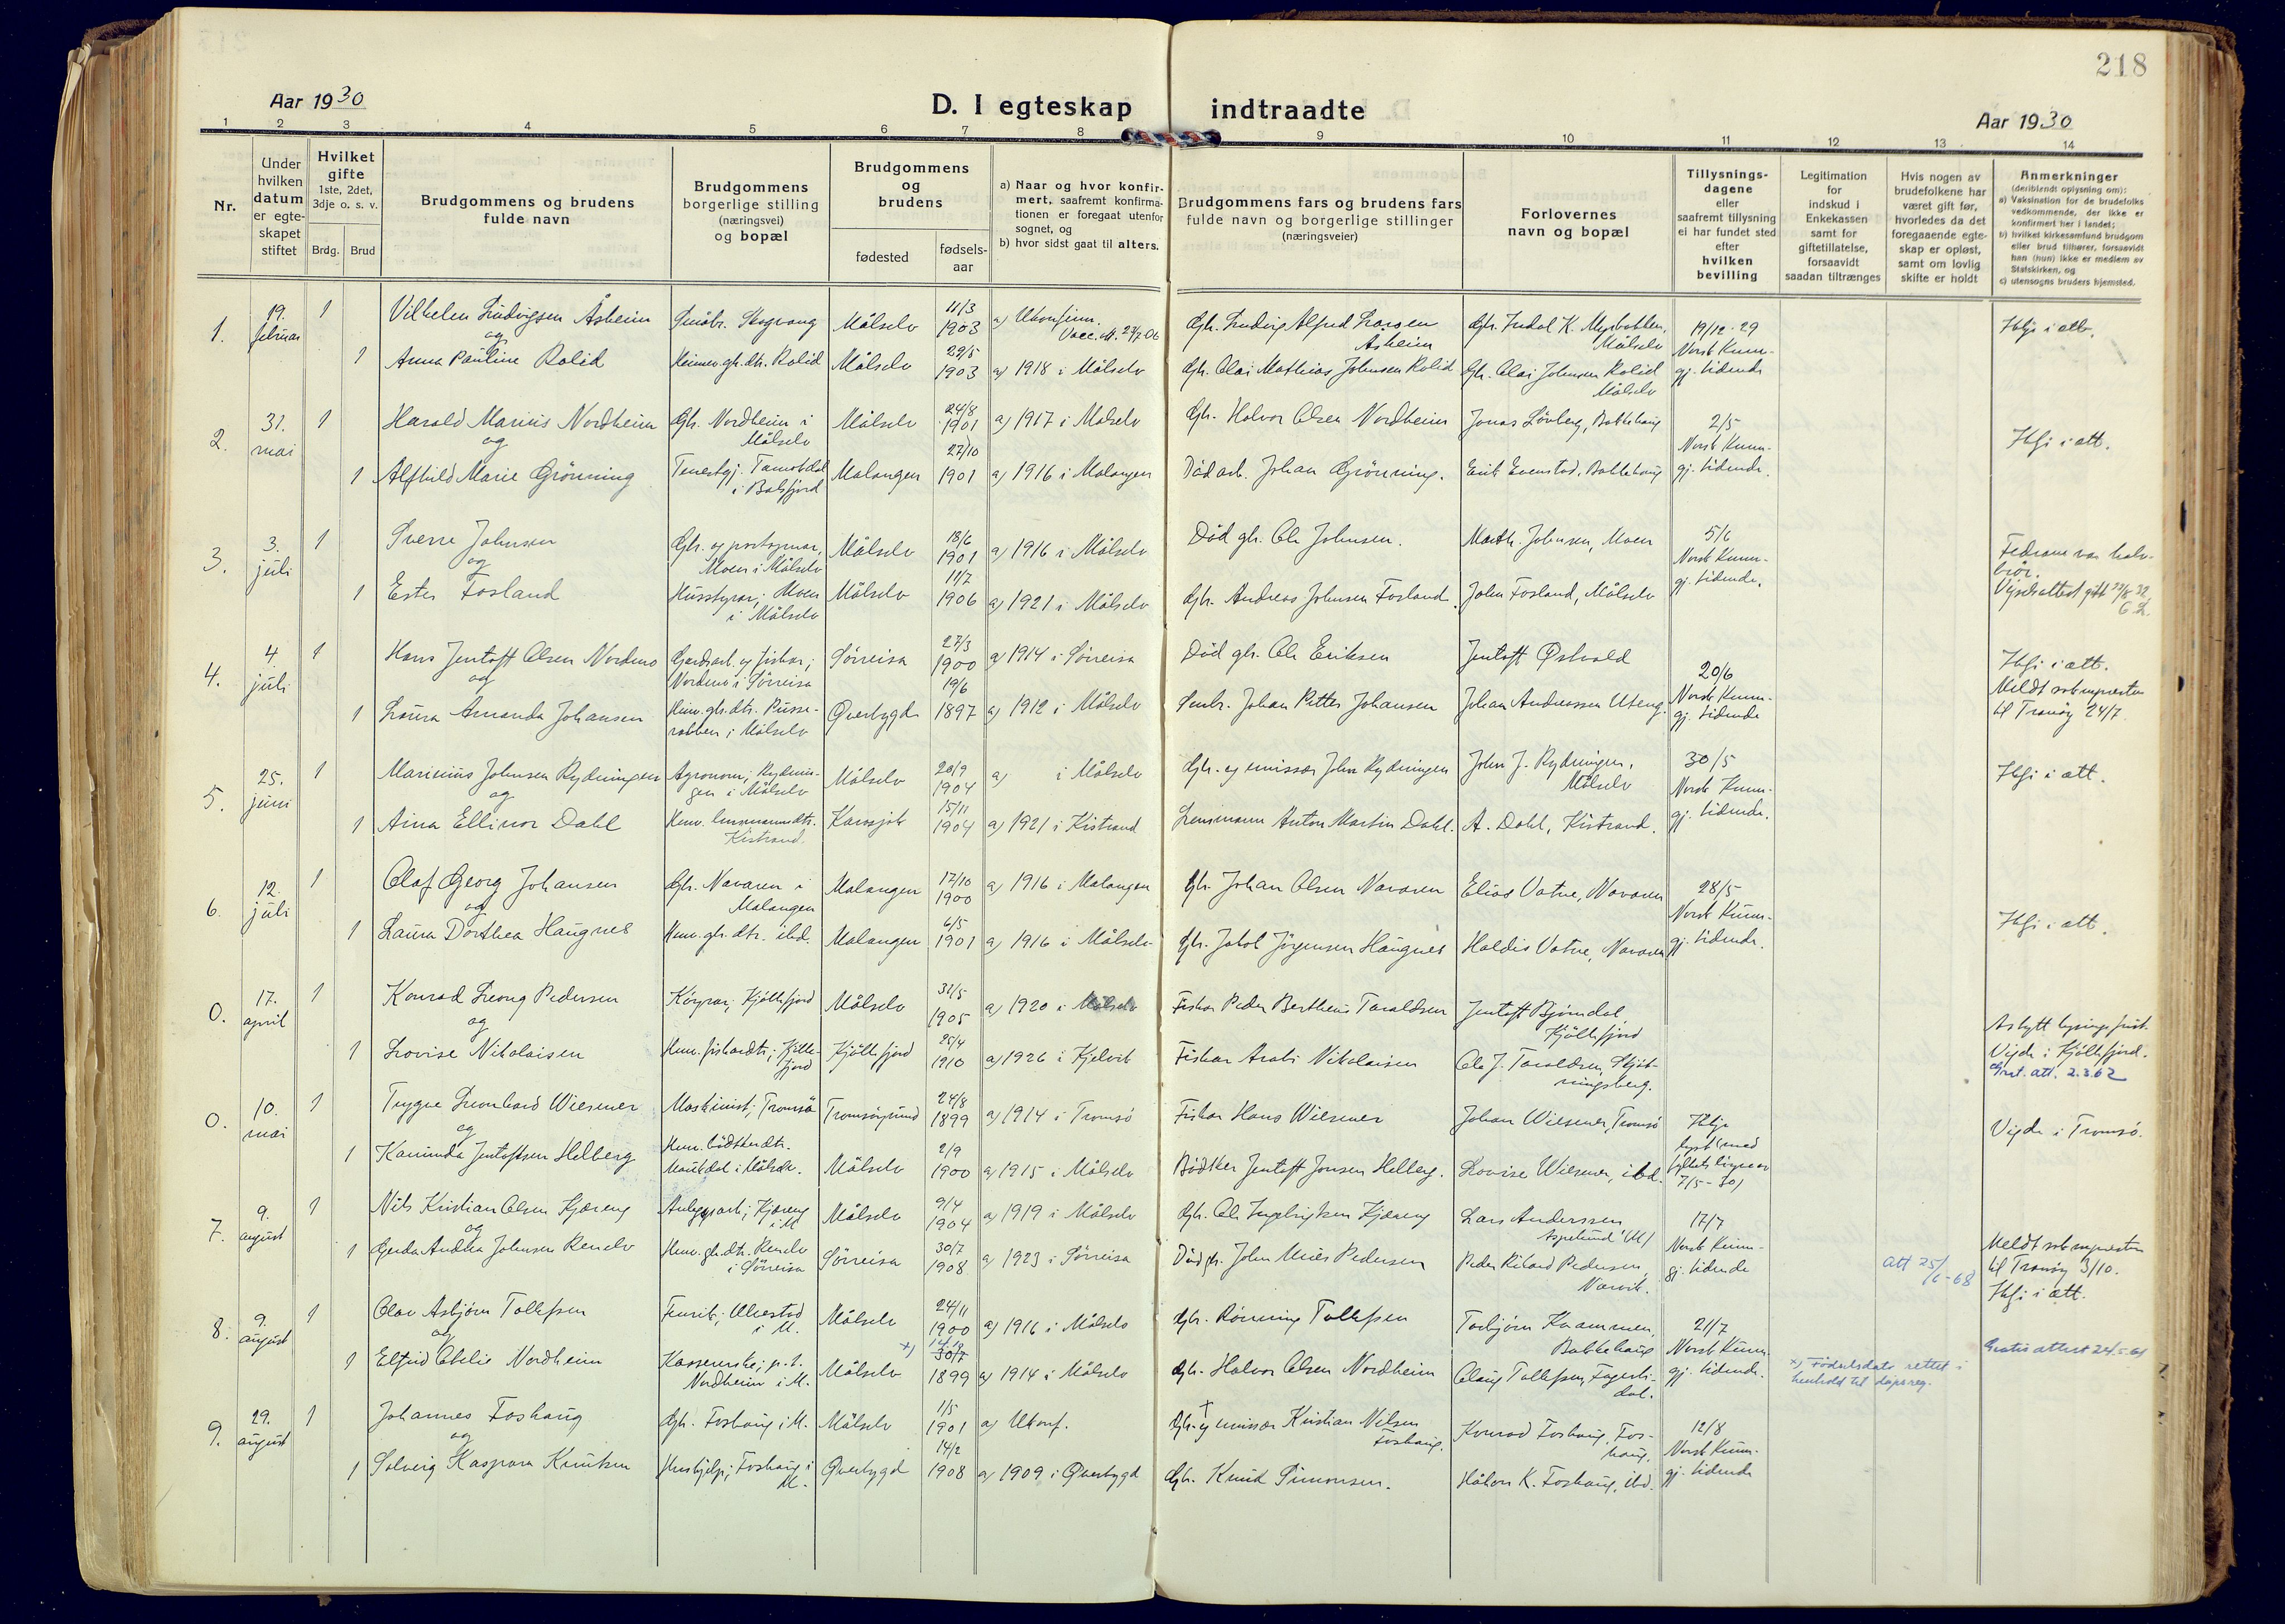 SATØ, Målselv sokneprestembete, Ministerialbok nr. 14, 1919-1932, s. 218